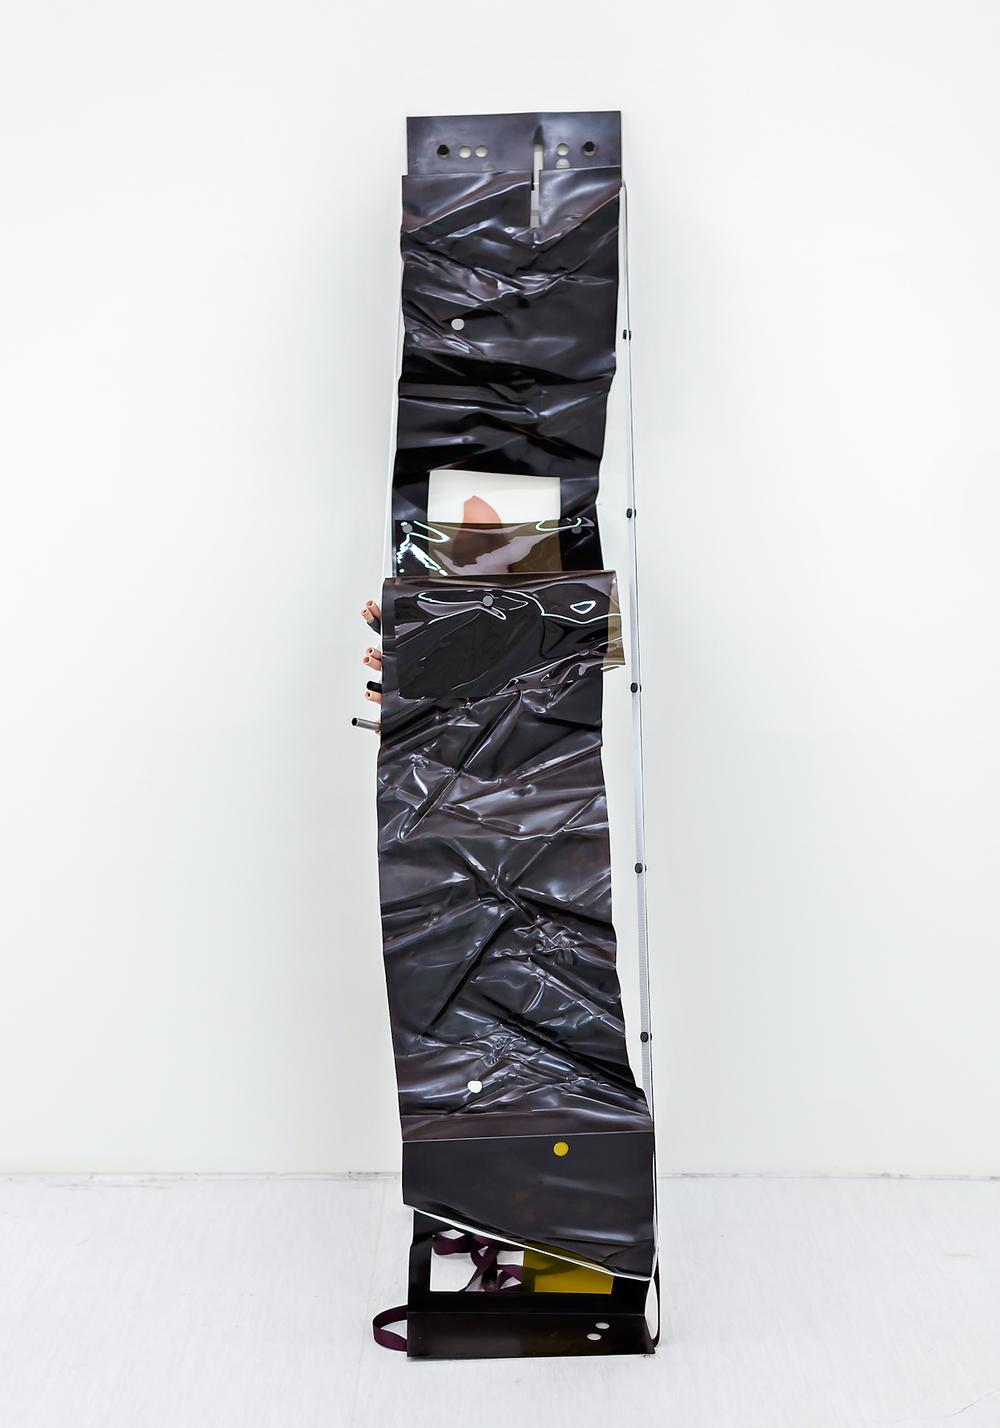 Alisa_Baremboym_Taipei-Biennial_2014_Amphicense-Systems-3.jpg